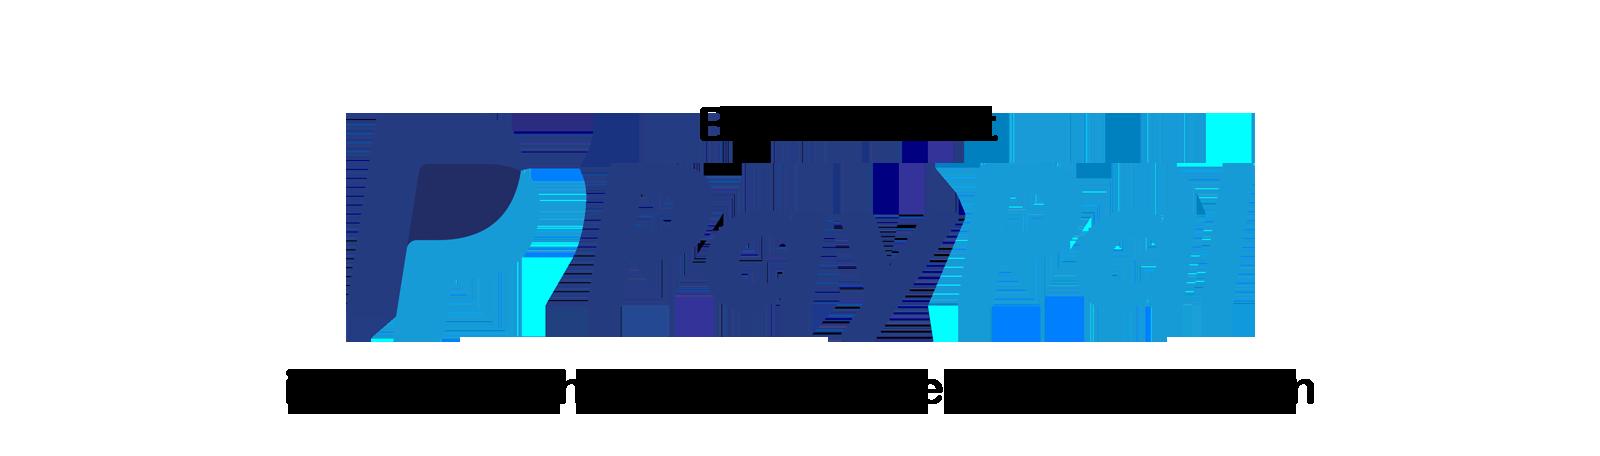 Paypal über Freunde